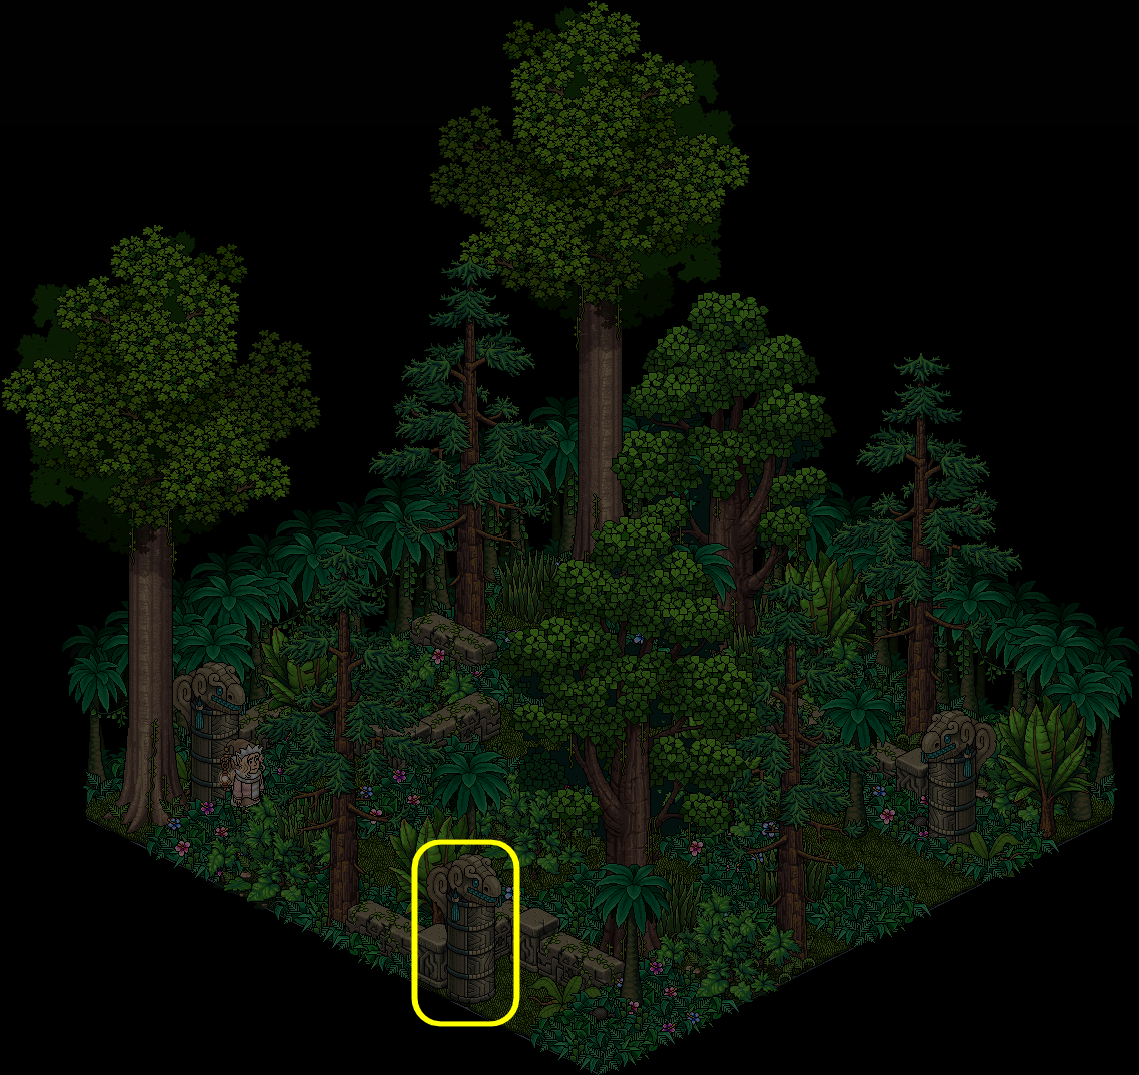 2.2 - Forêt profonde de Tiki Tuha 1